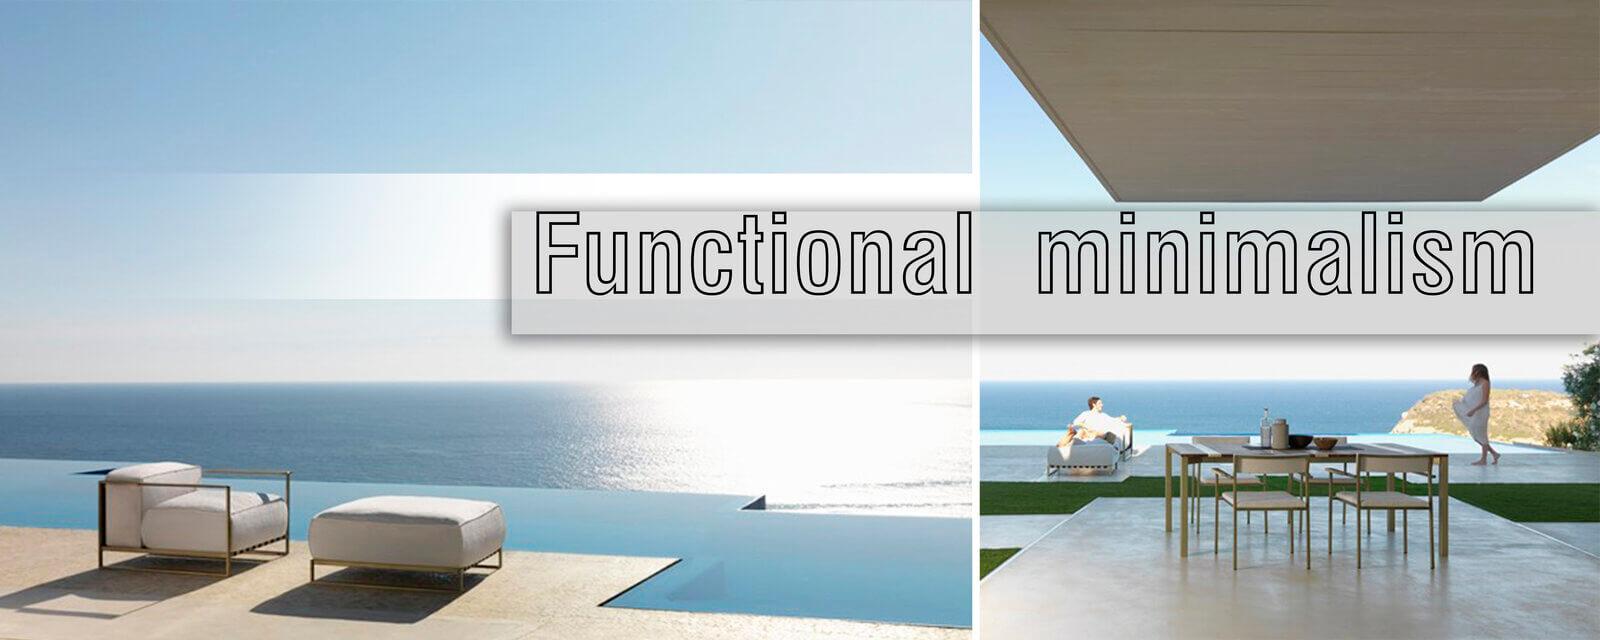 Functional minimalism